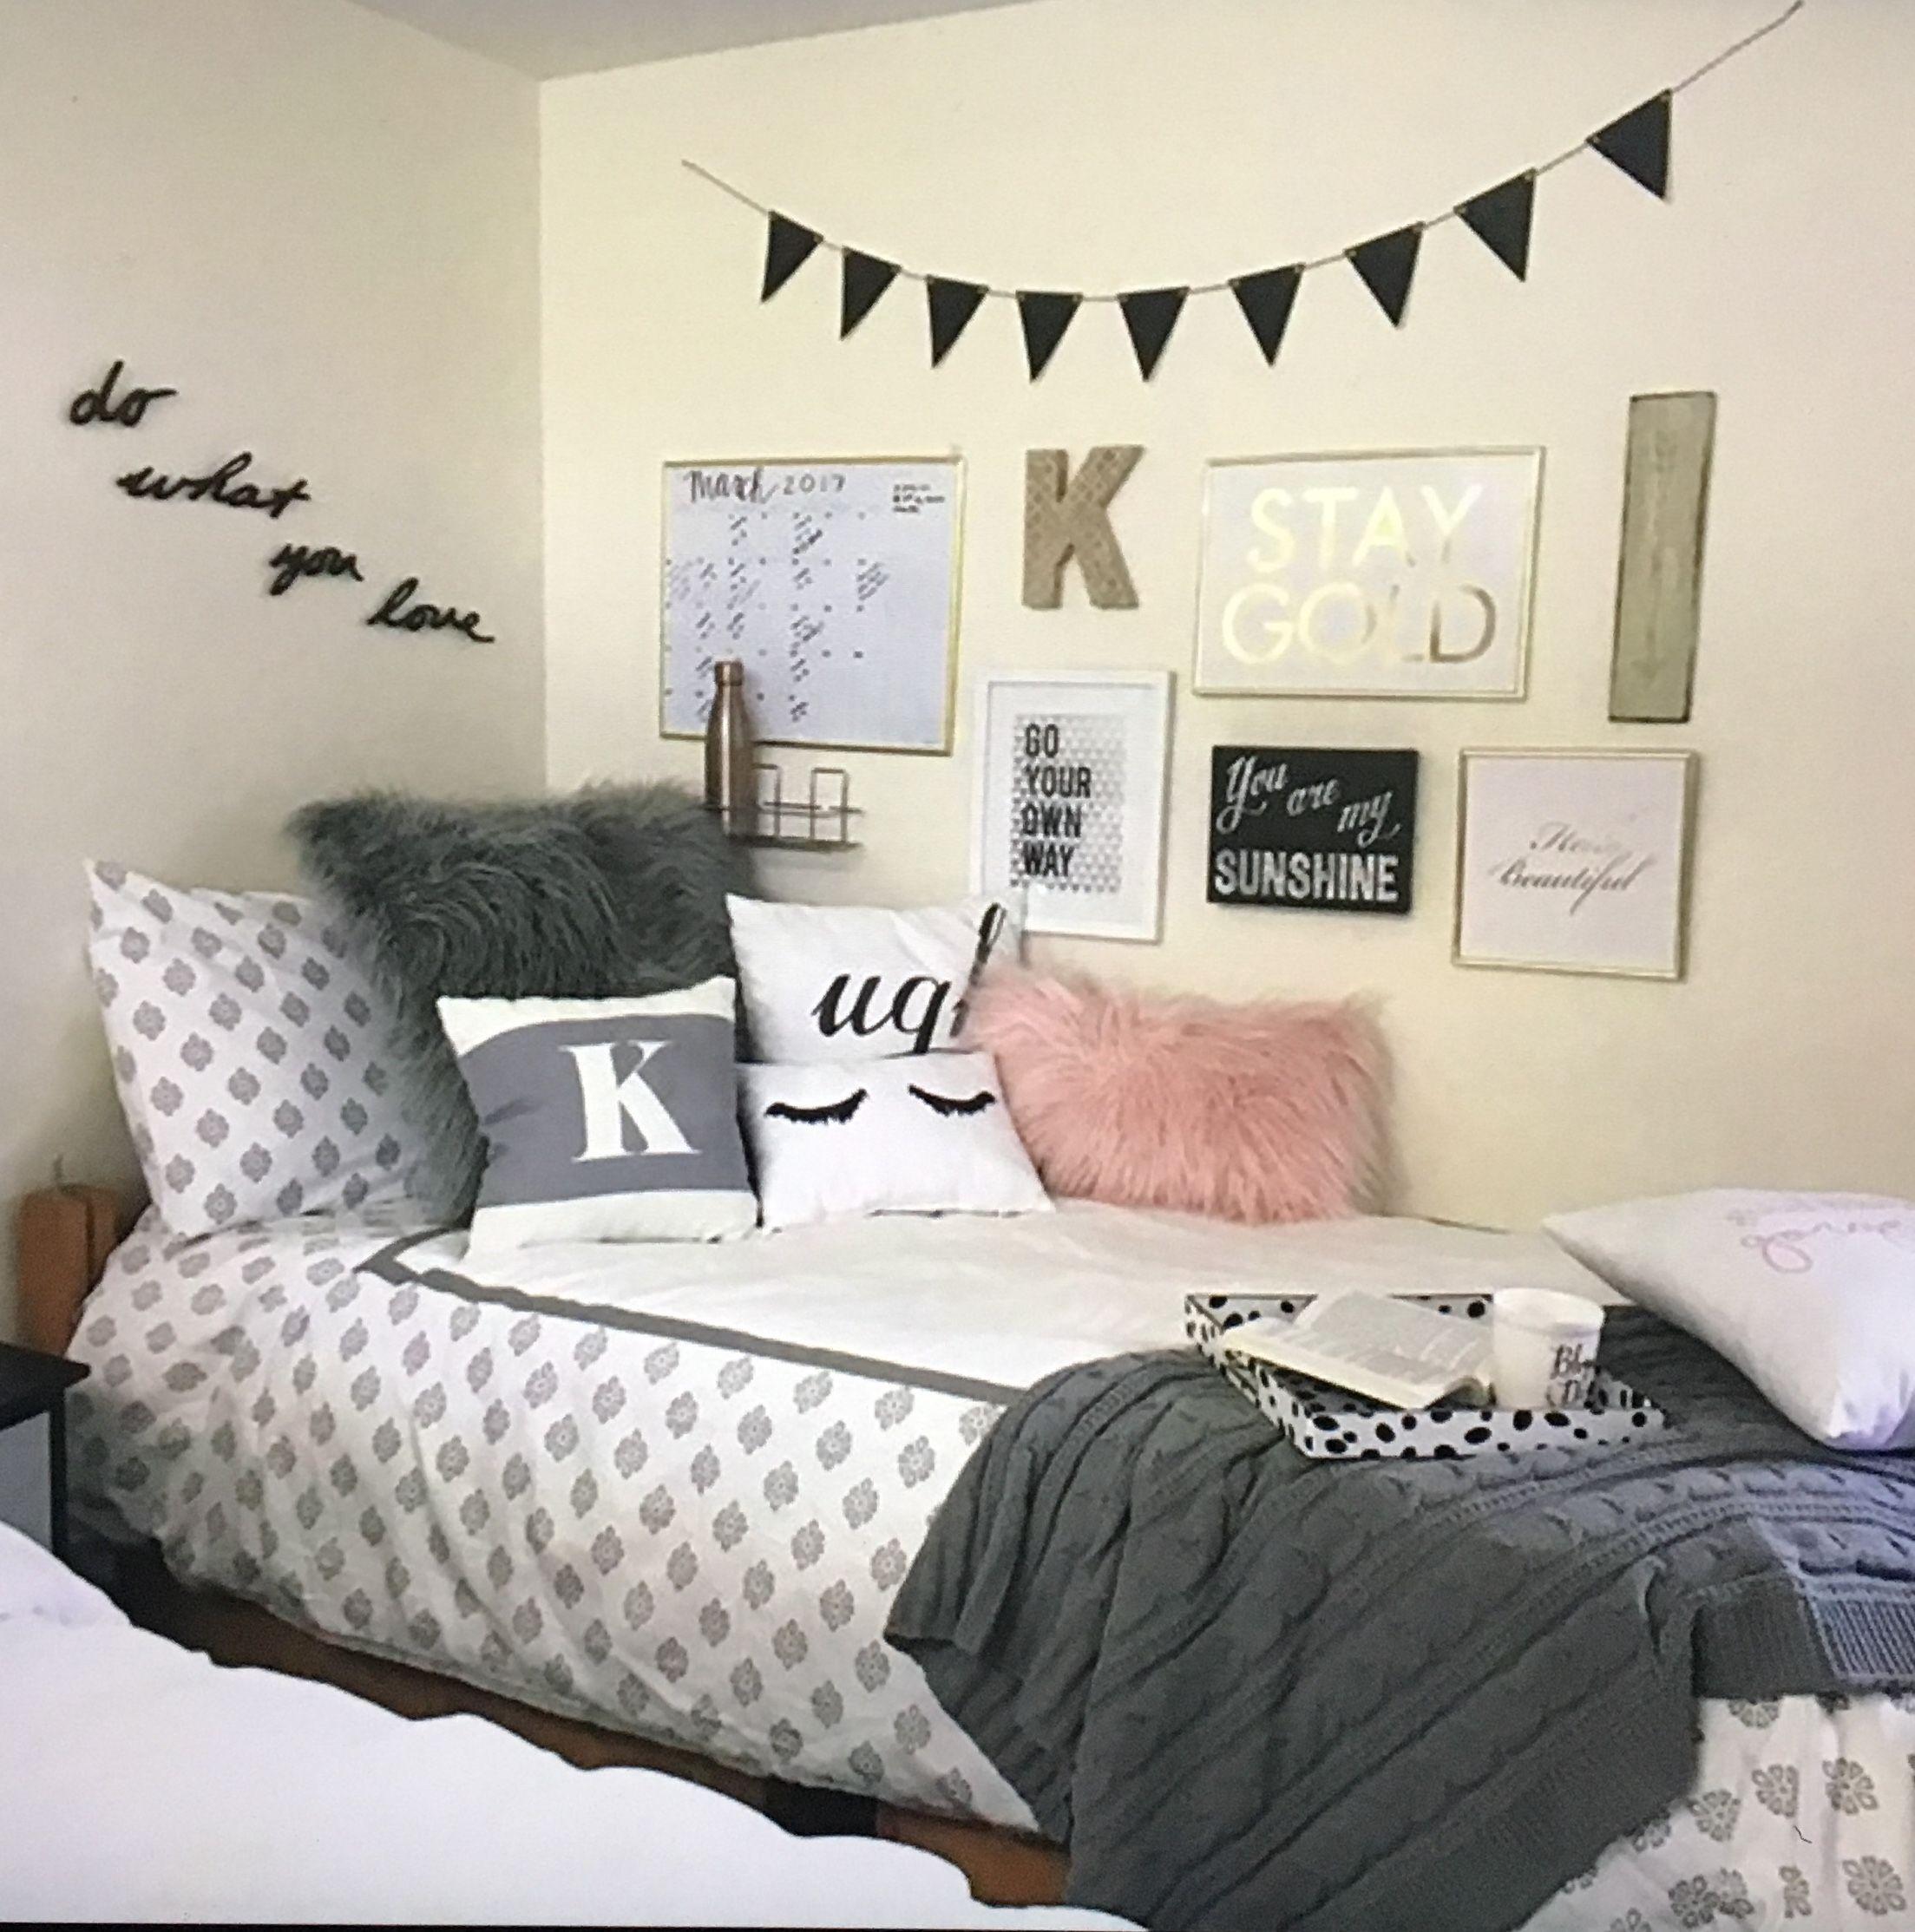 Pin by Mikaela Swiel on Bedrooms ideas   Dorm room designs ...